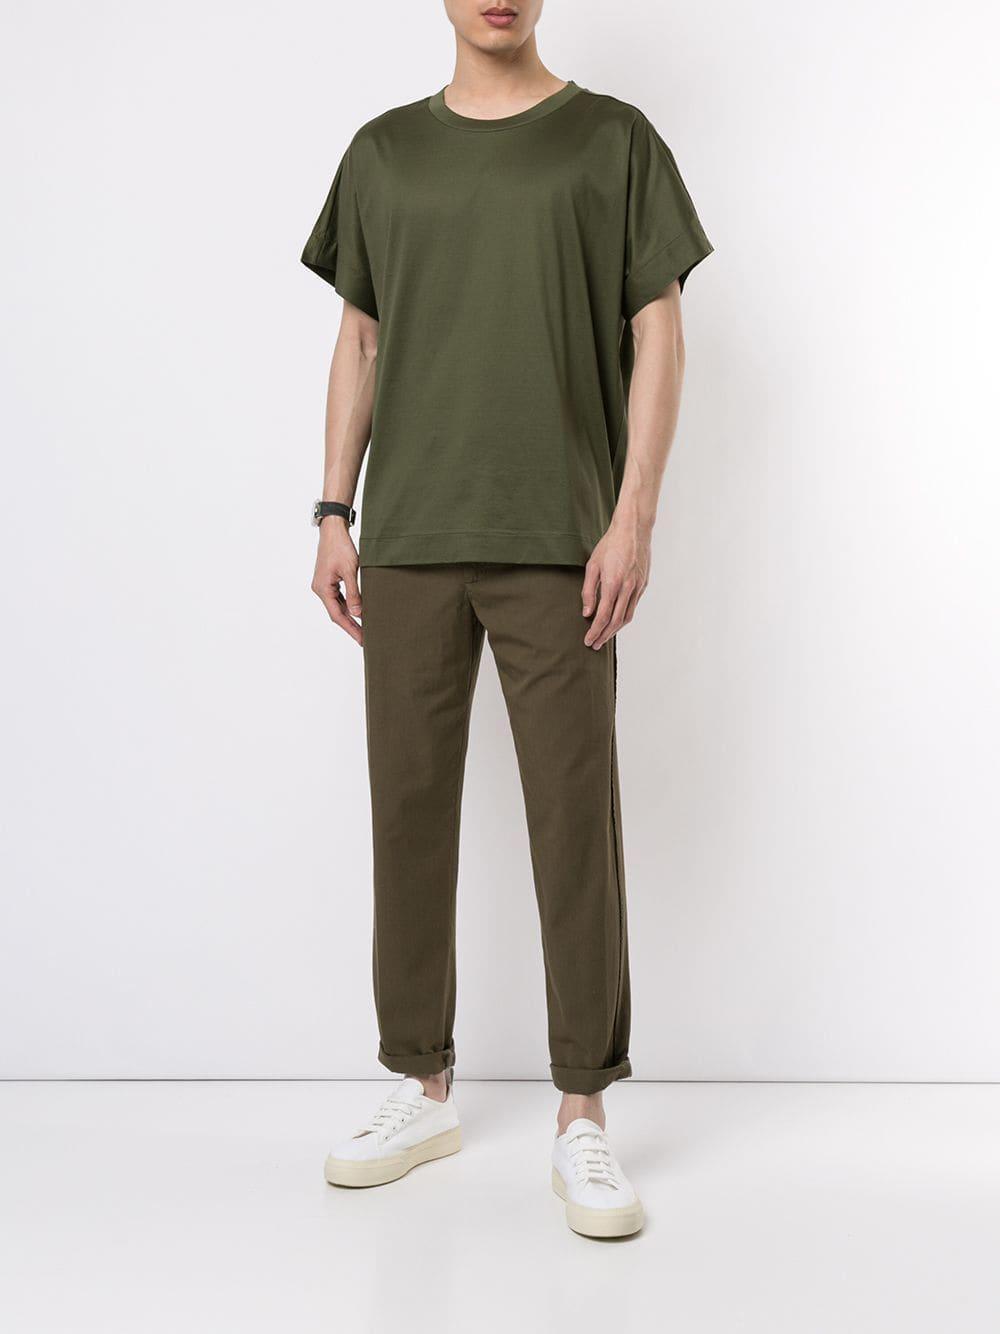 17ea87d9 Lyst - Cerruti 1881 Plain T-shirt in Green for Men